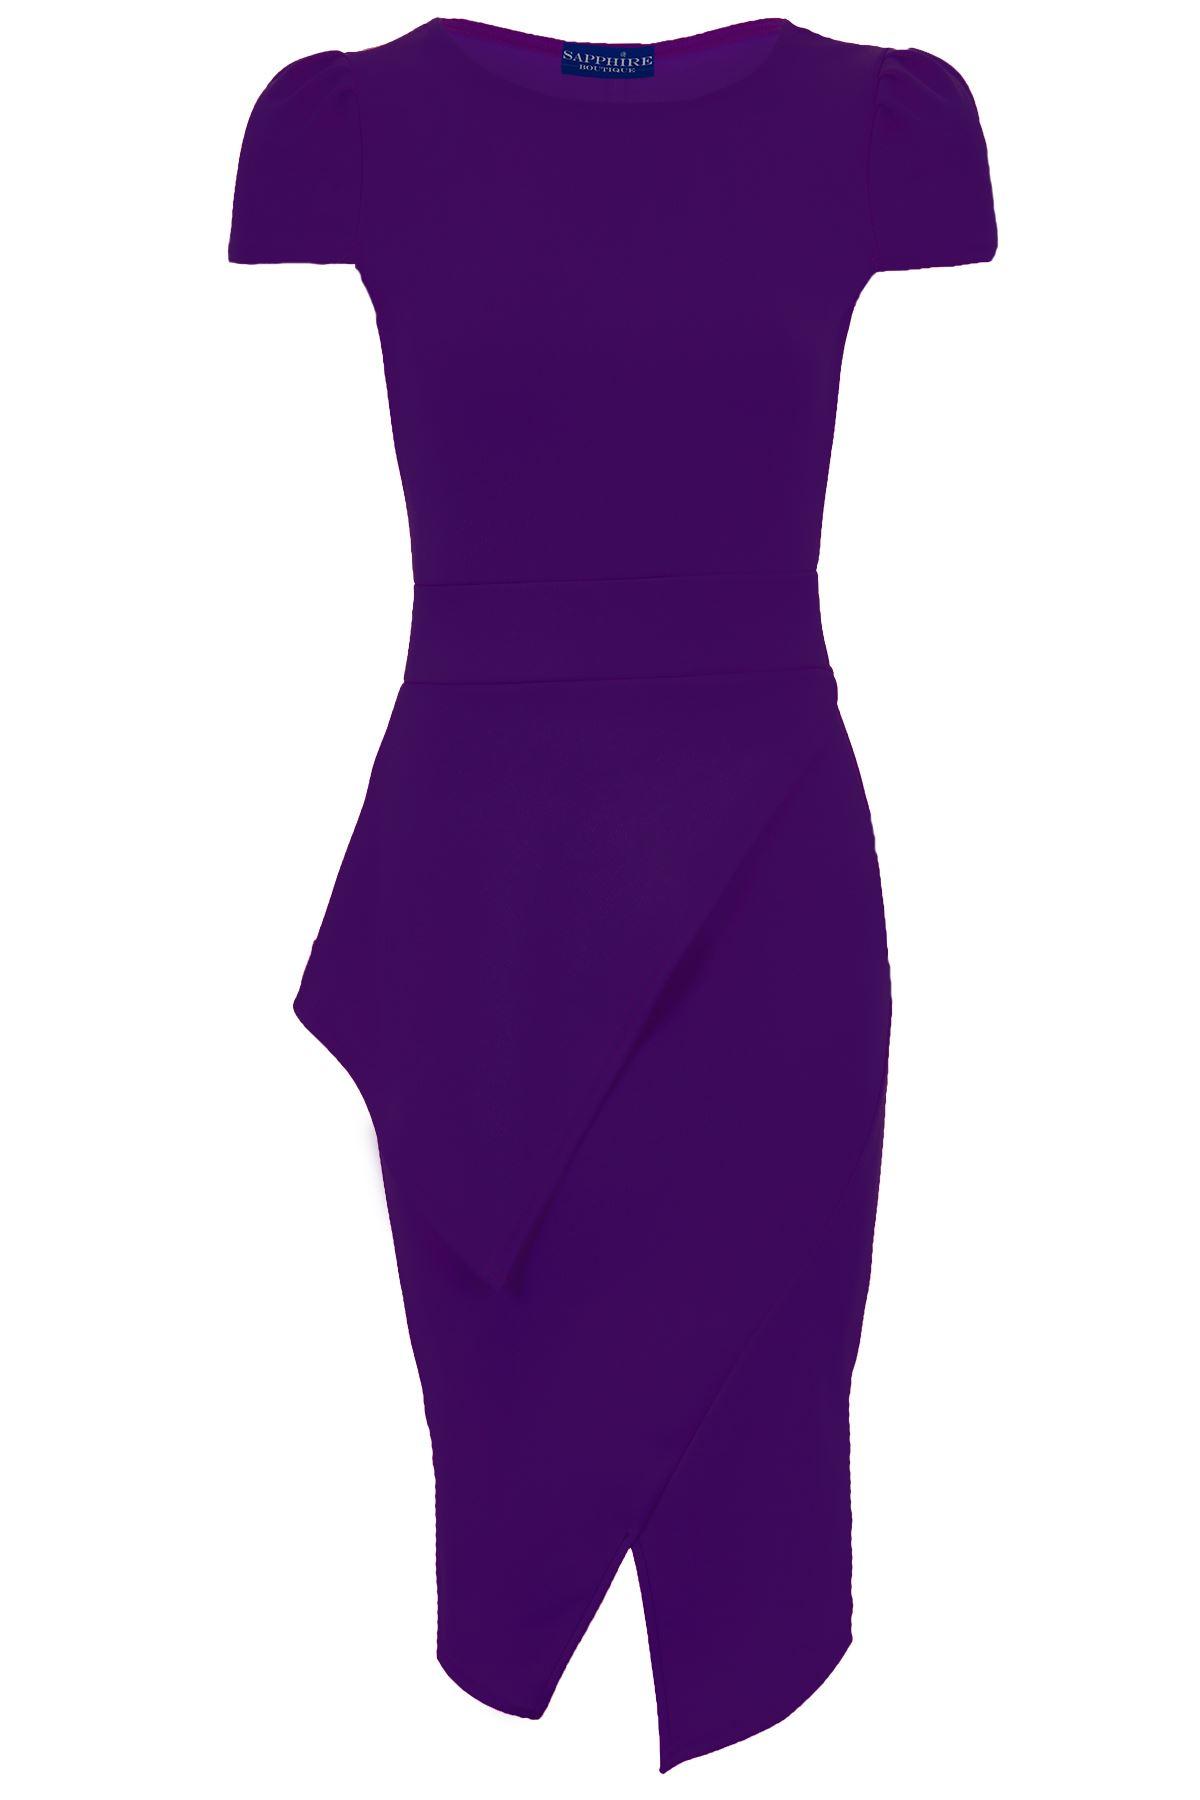 Ladies Asymmetric Neon Pencil Bodycon Knee Length Midi Women\'s Party ...